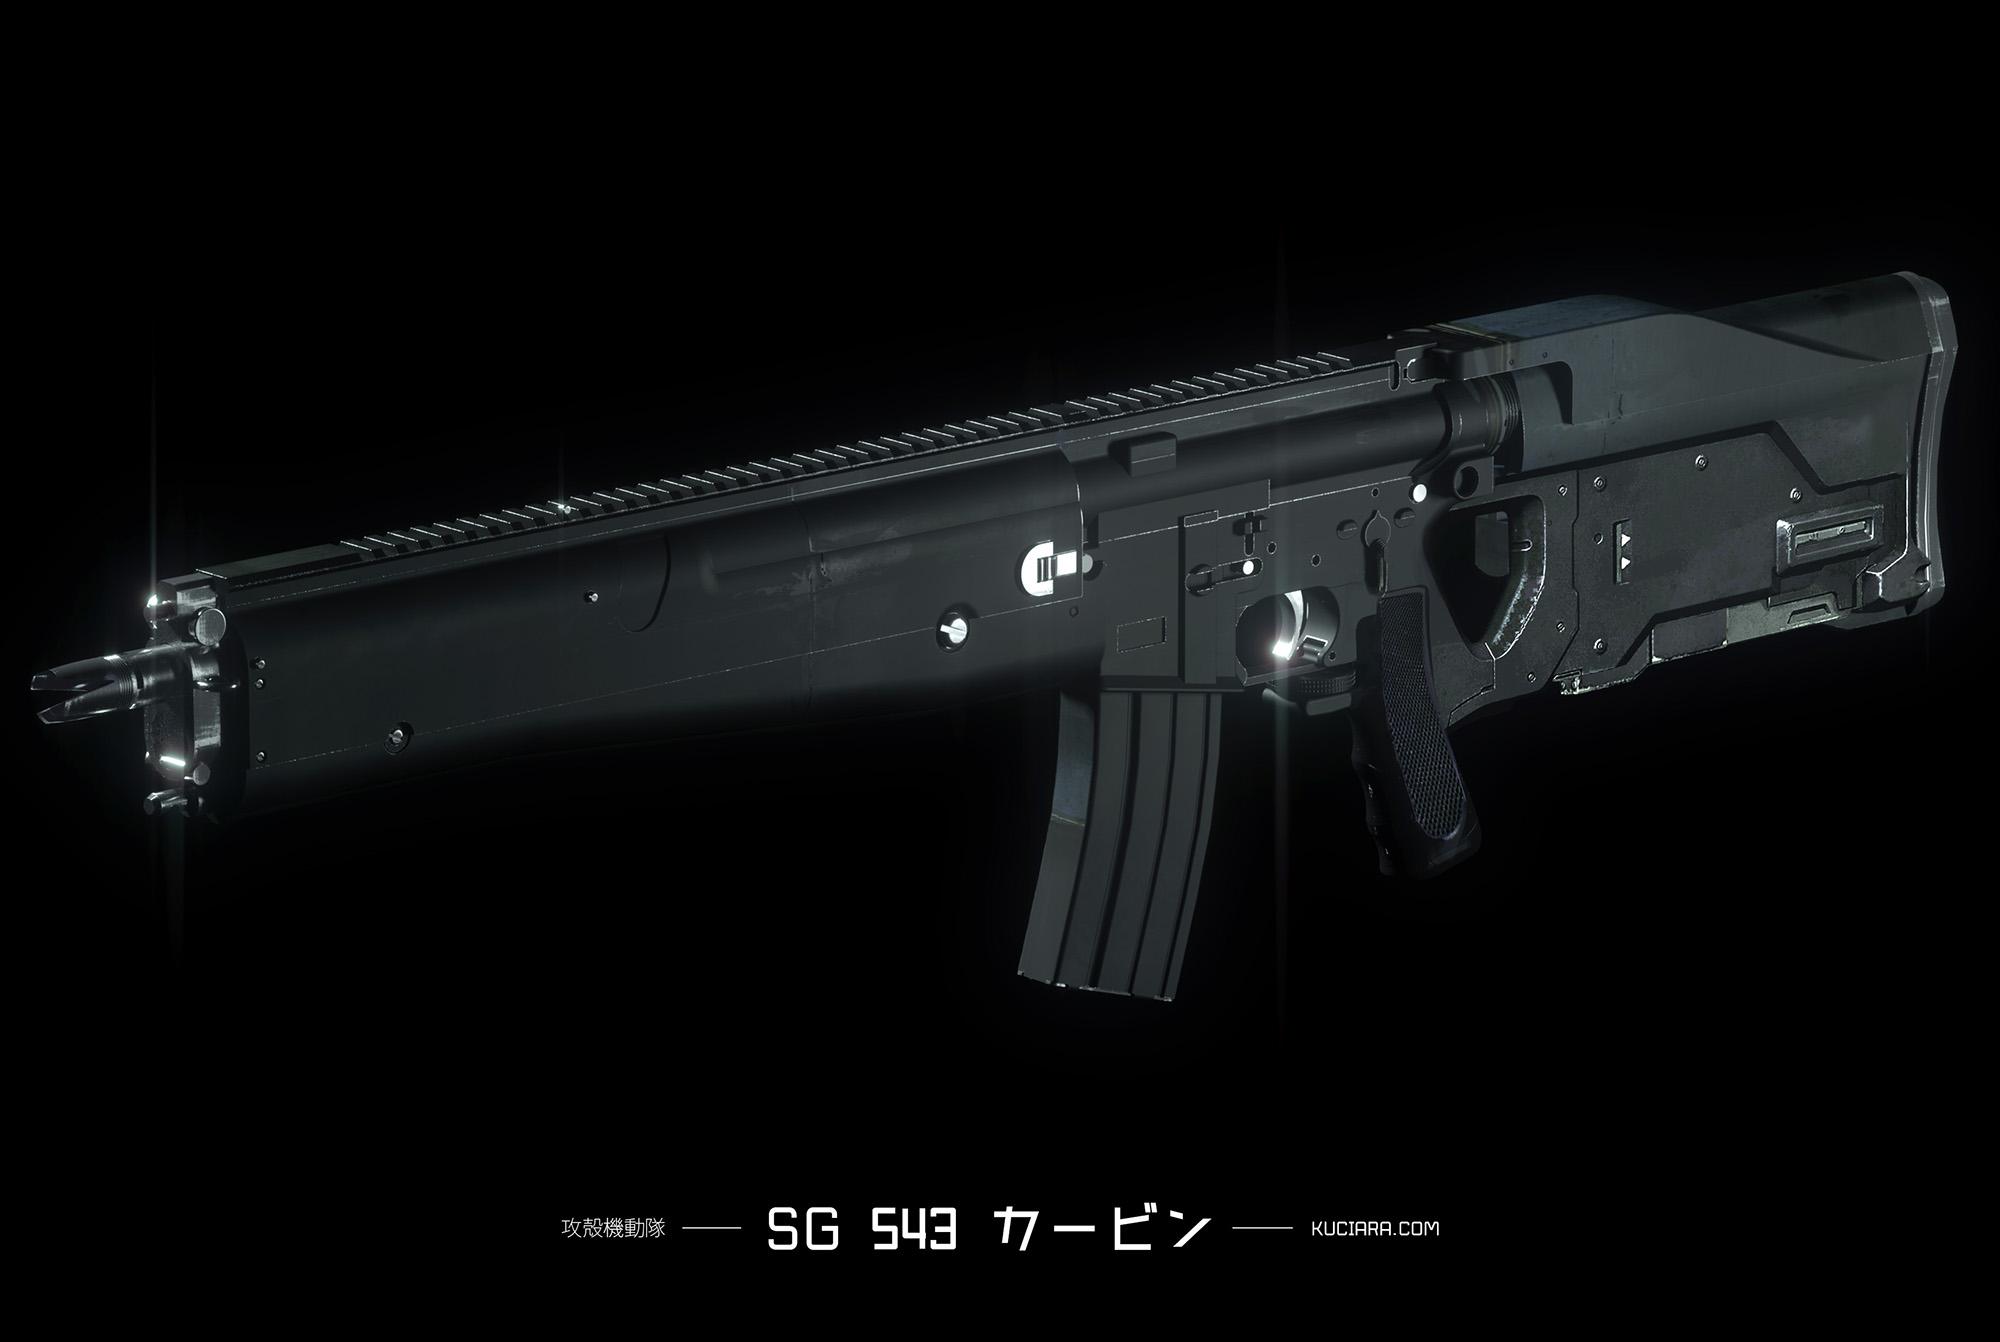 150813_WPN_Rifle_MK_v002.jpg